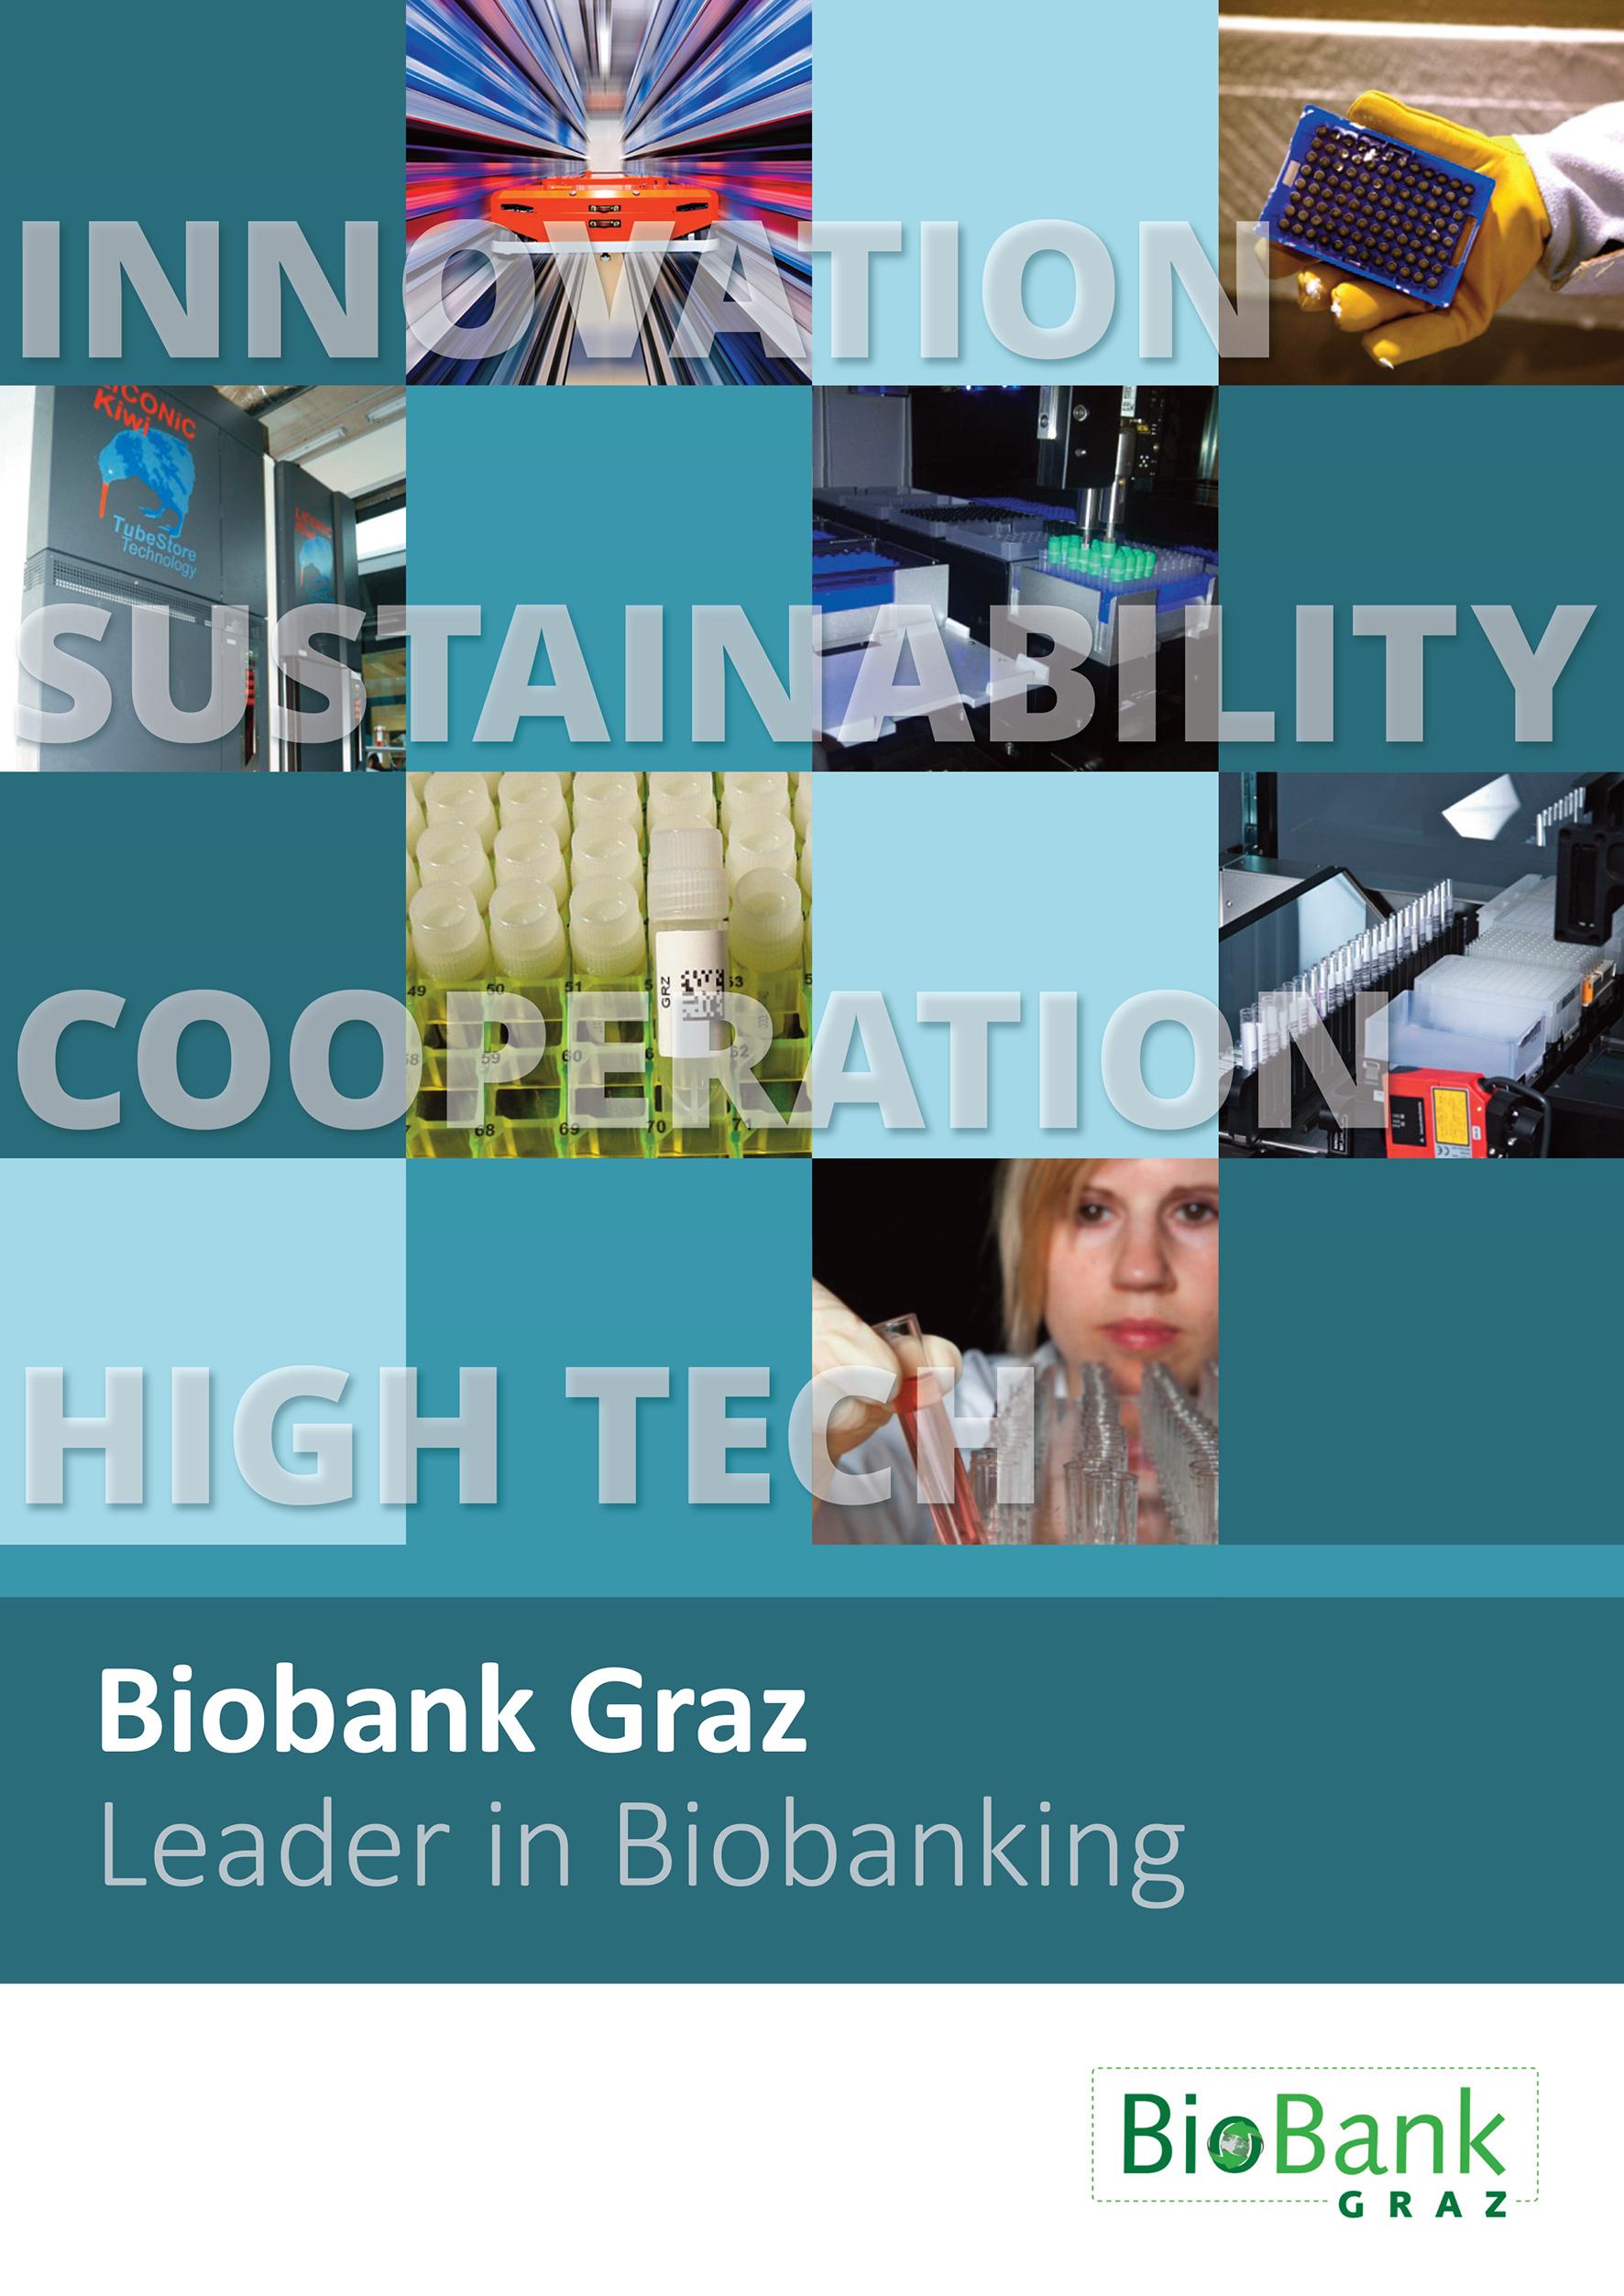 Biobank Graz booklet cover